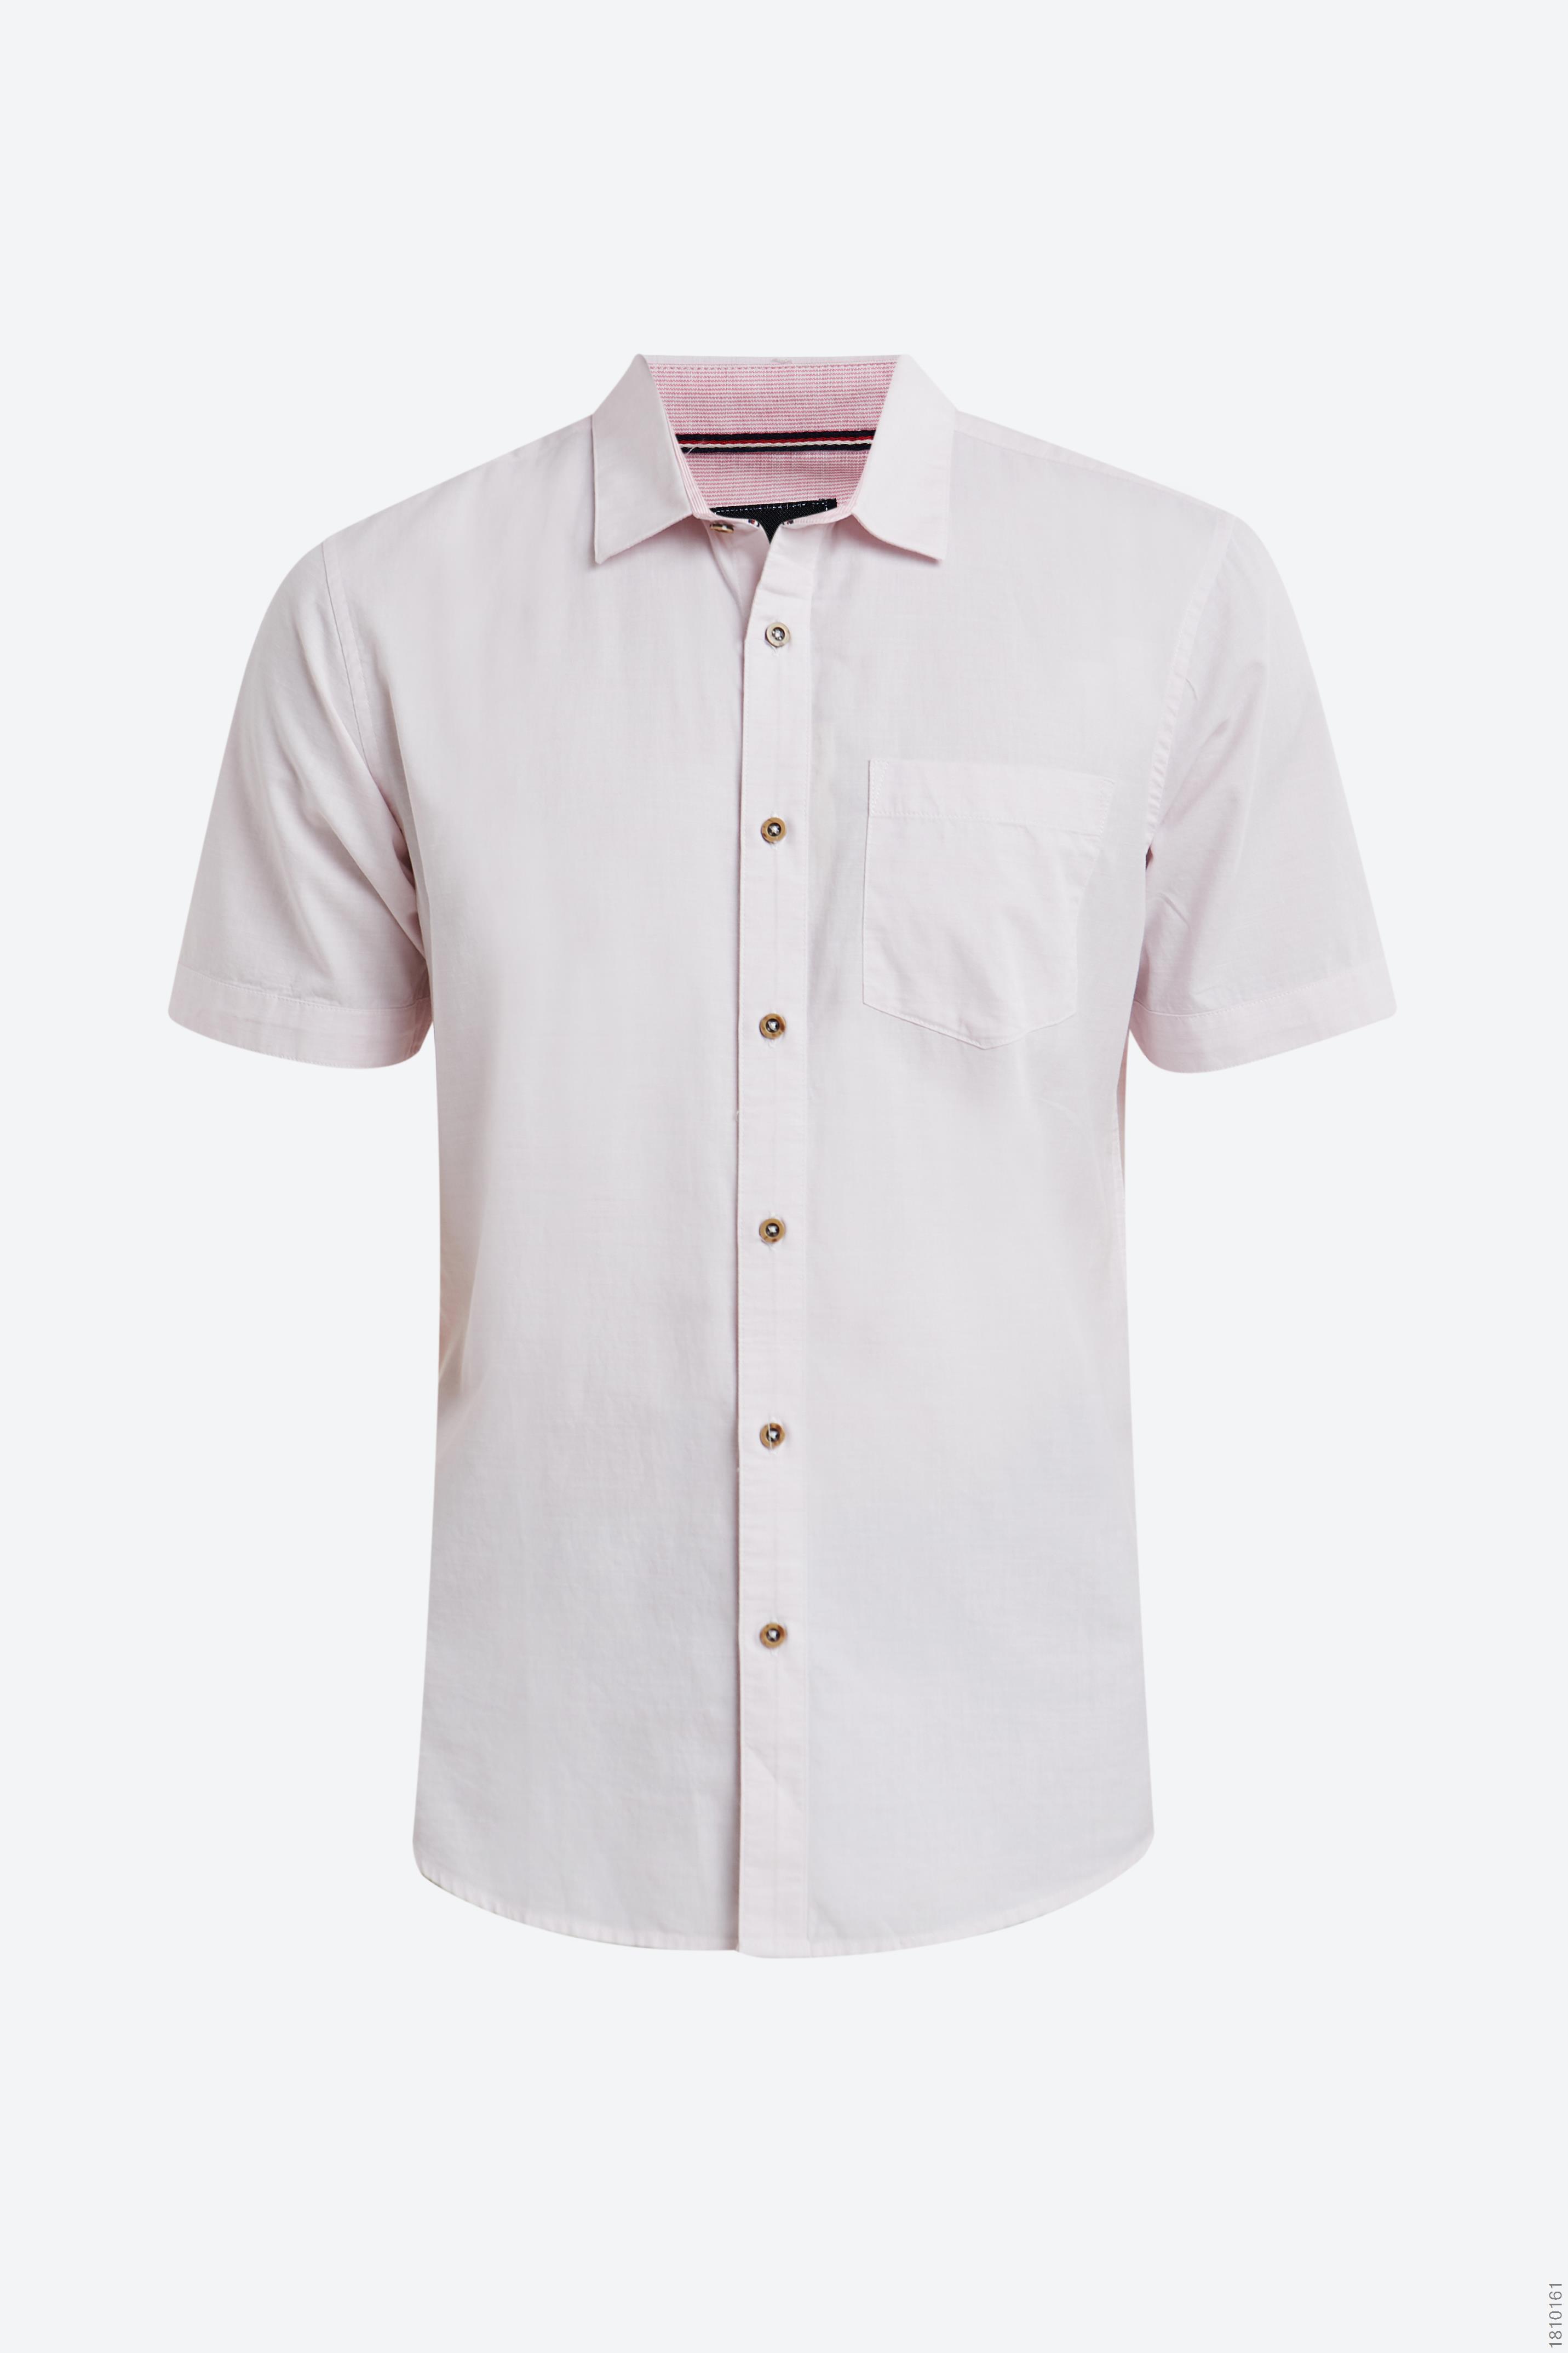 áo sơmi nam - 1810161